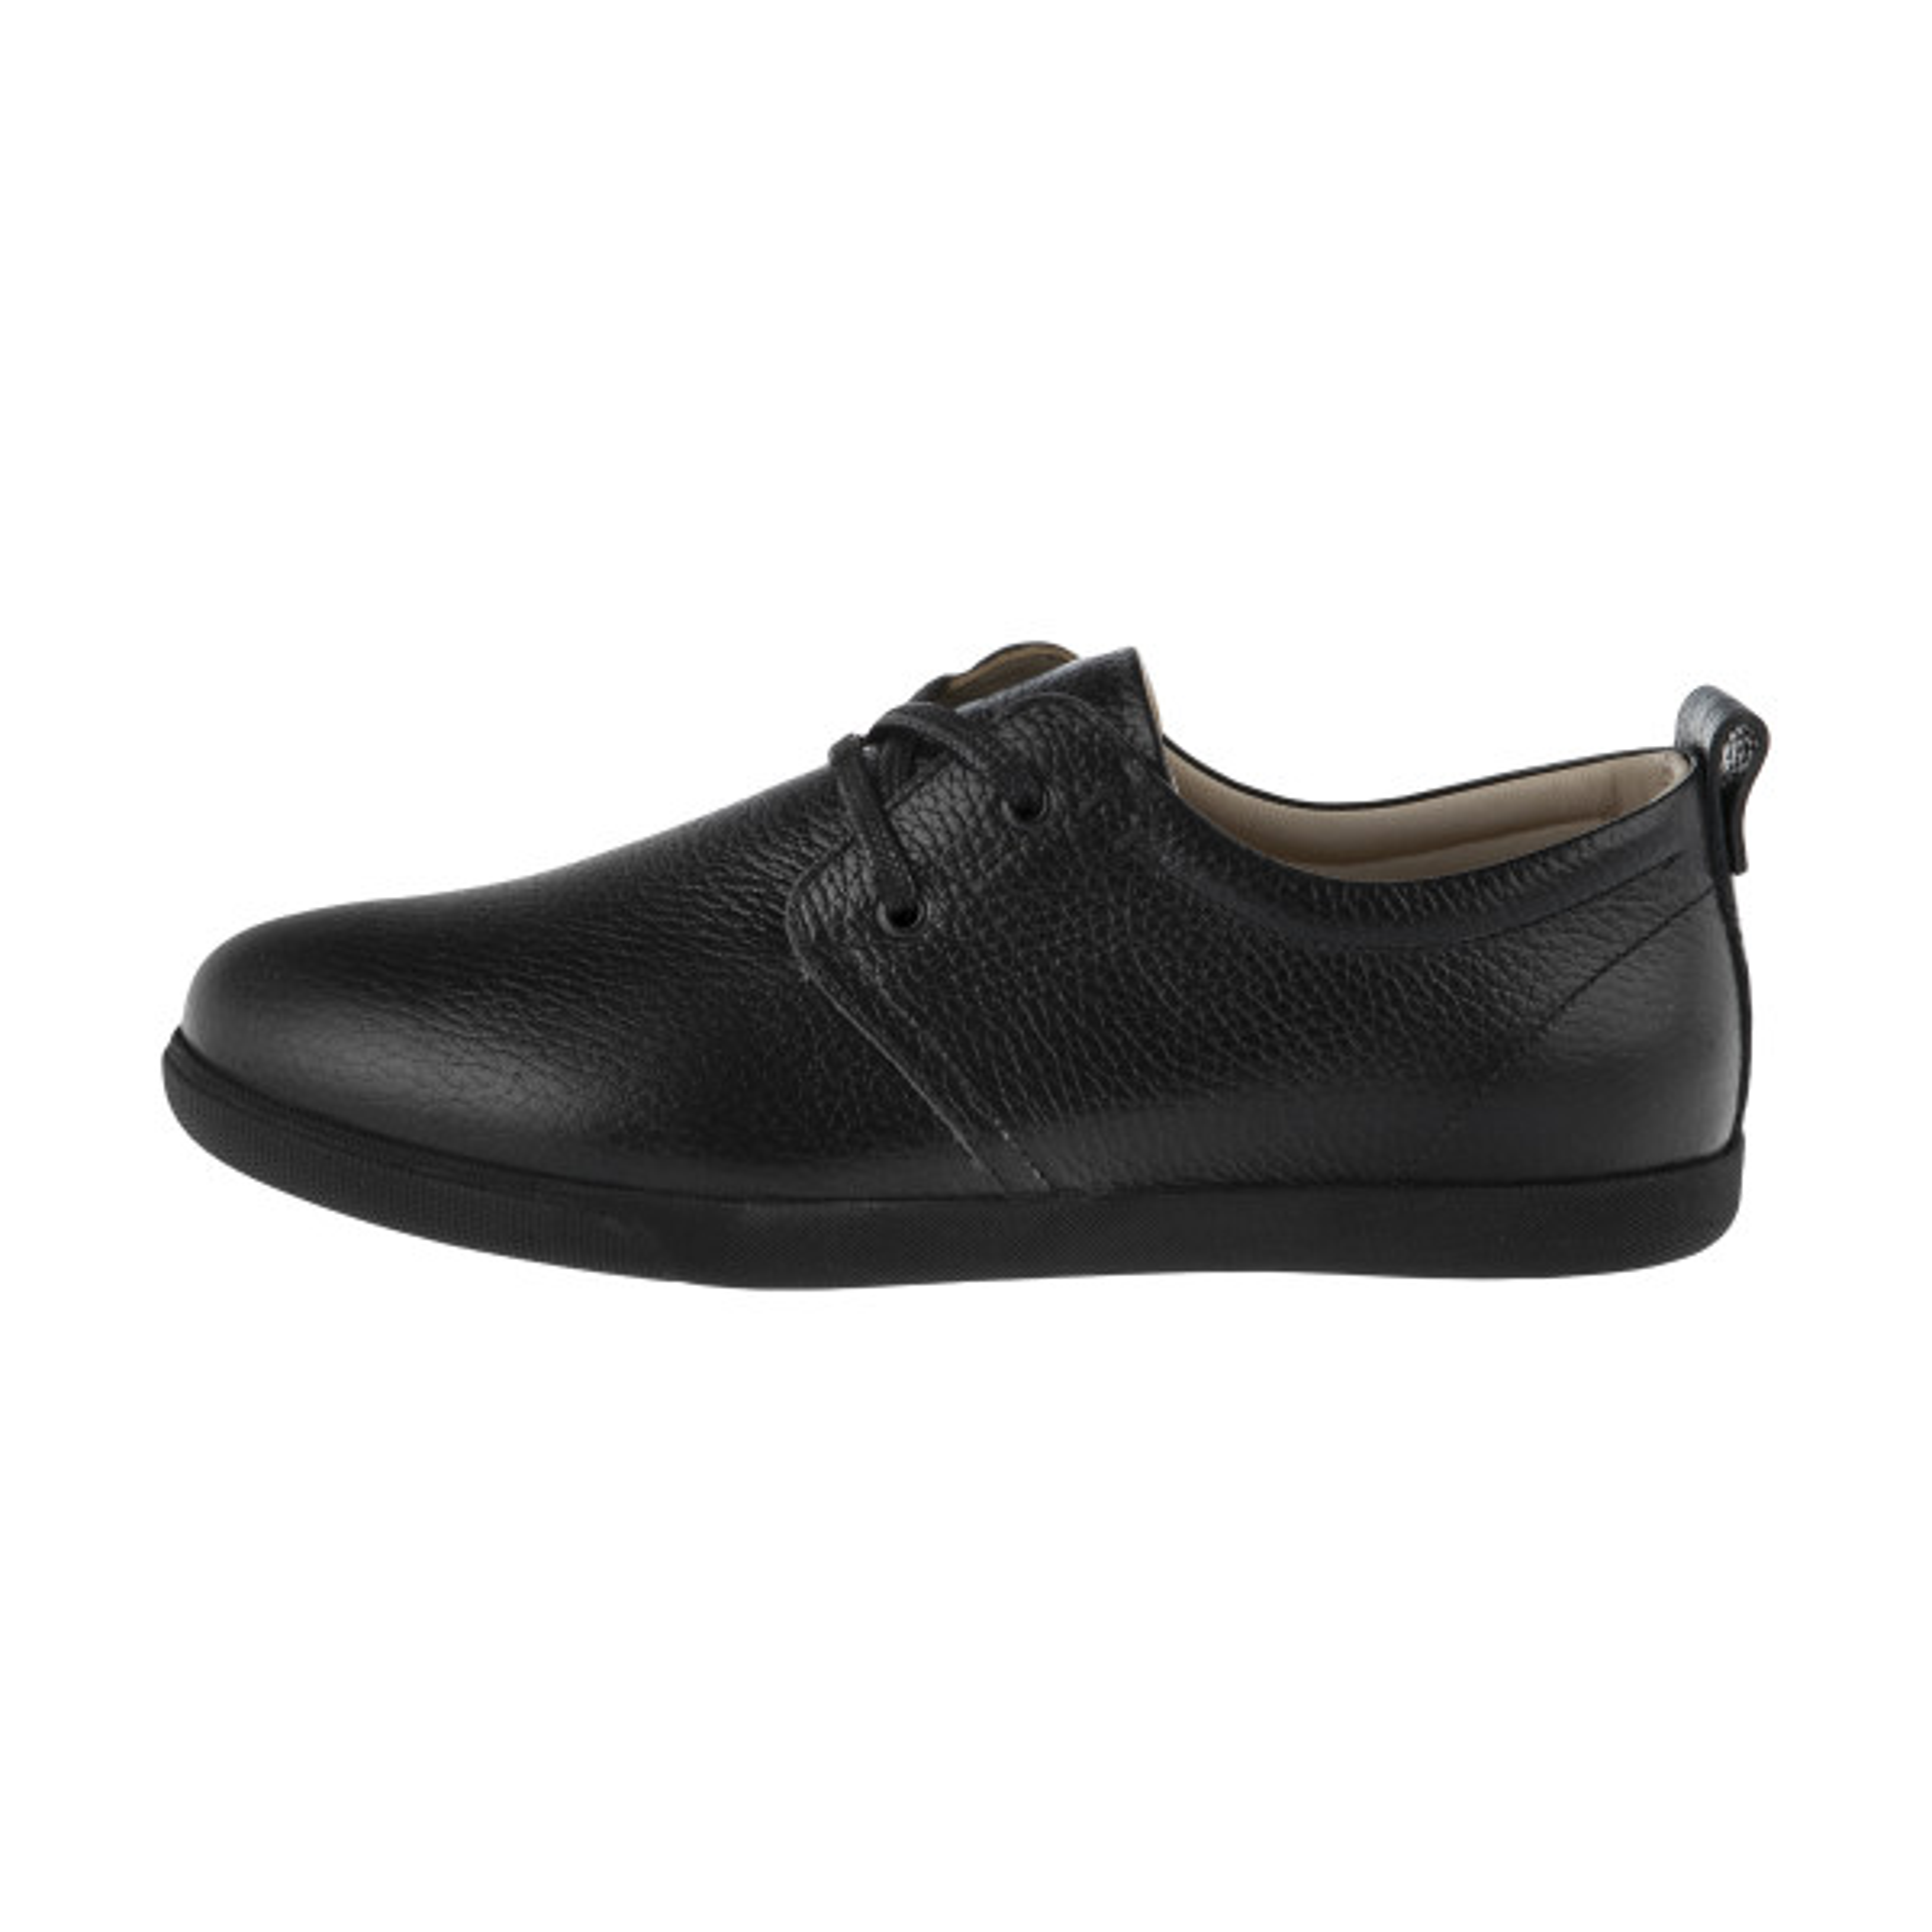 کفش روزمره زنانه برتونیکس مدل 155-B-027